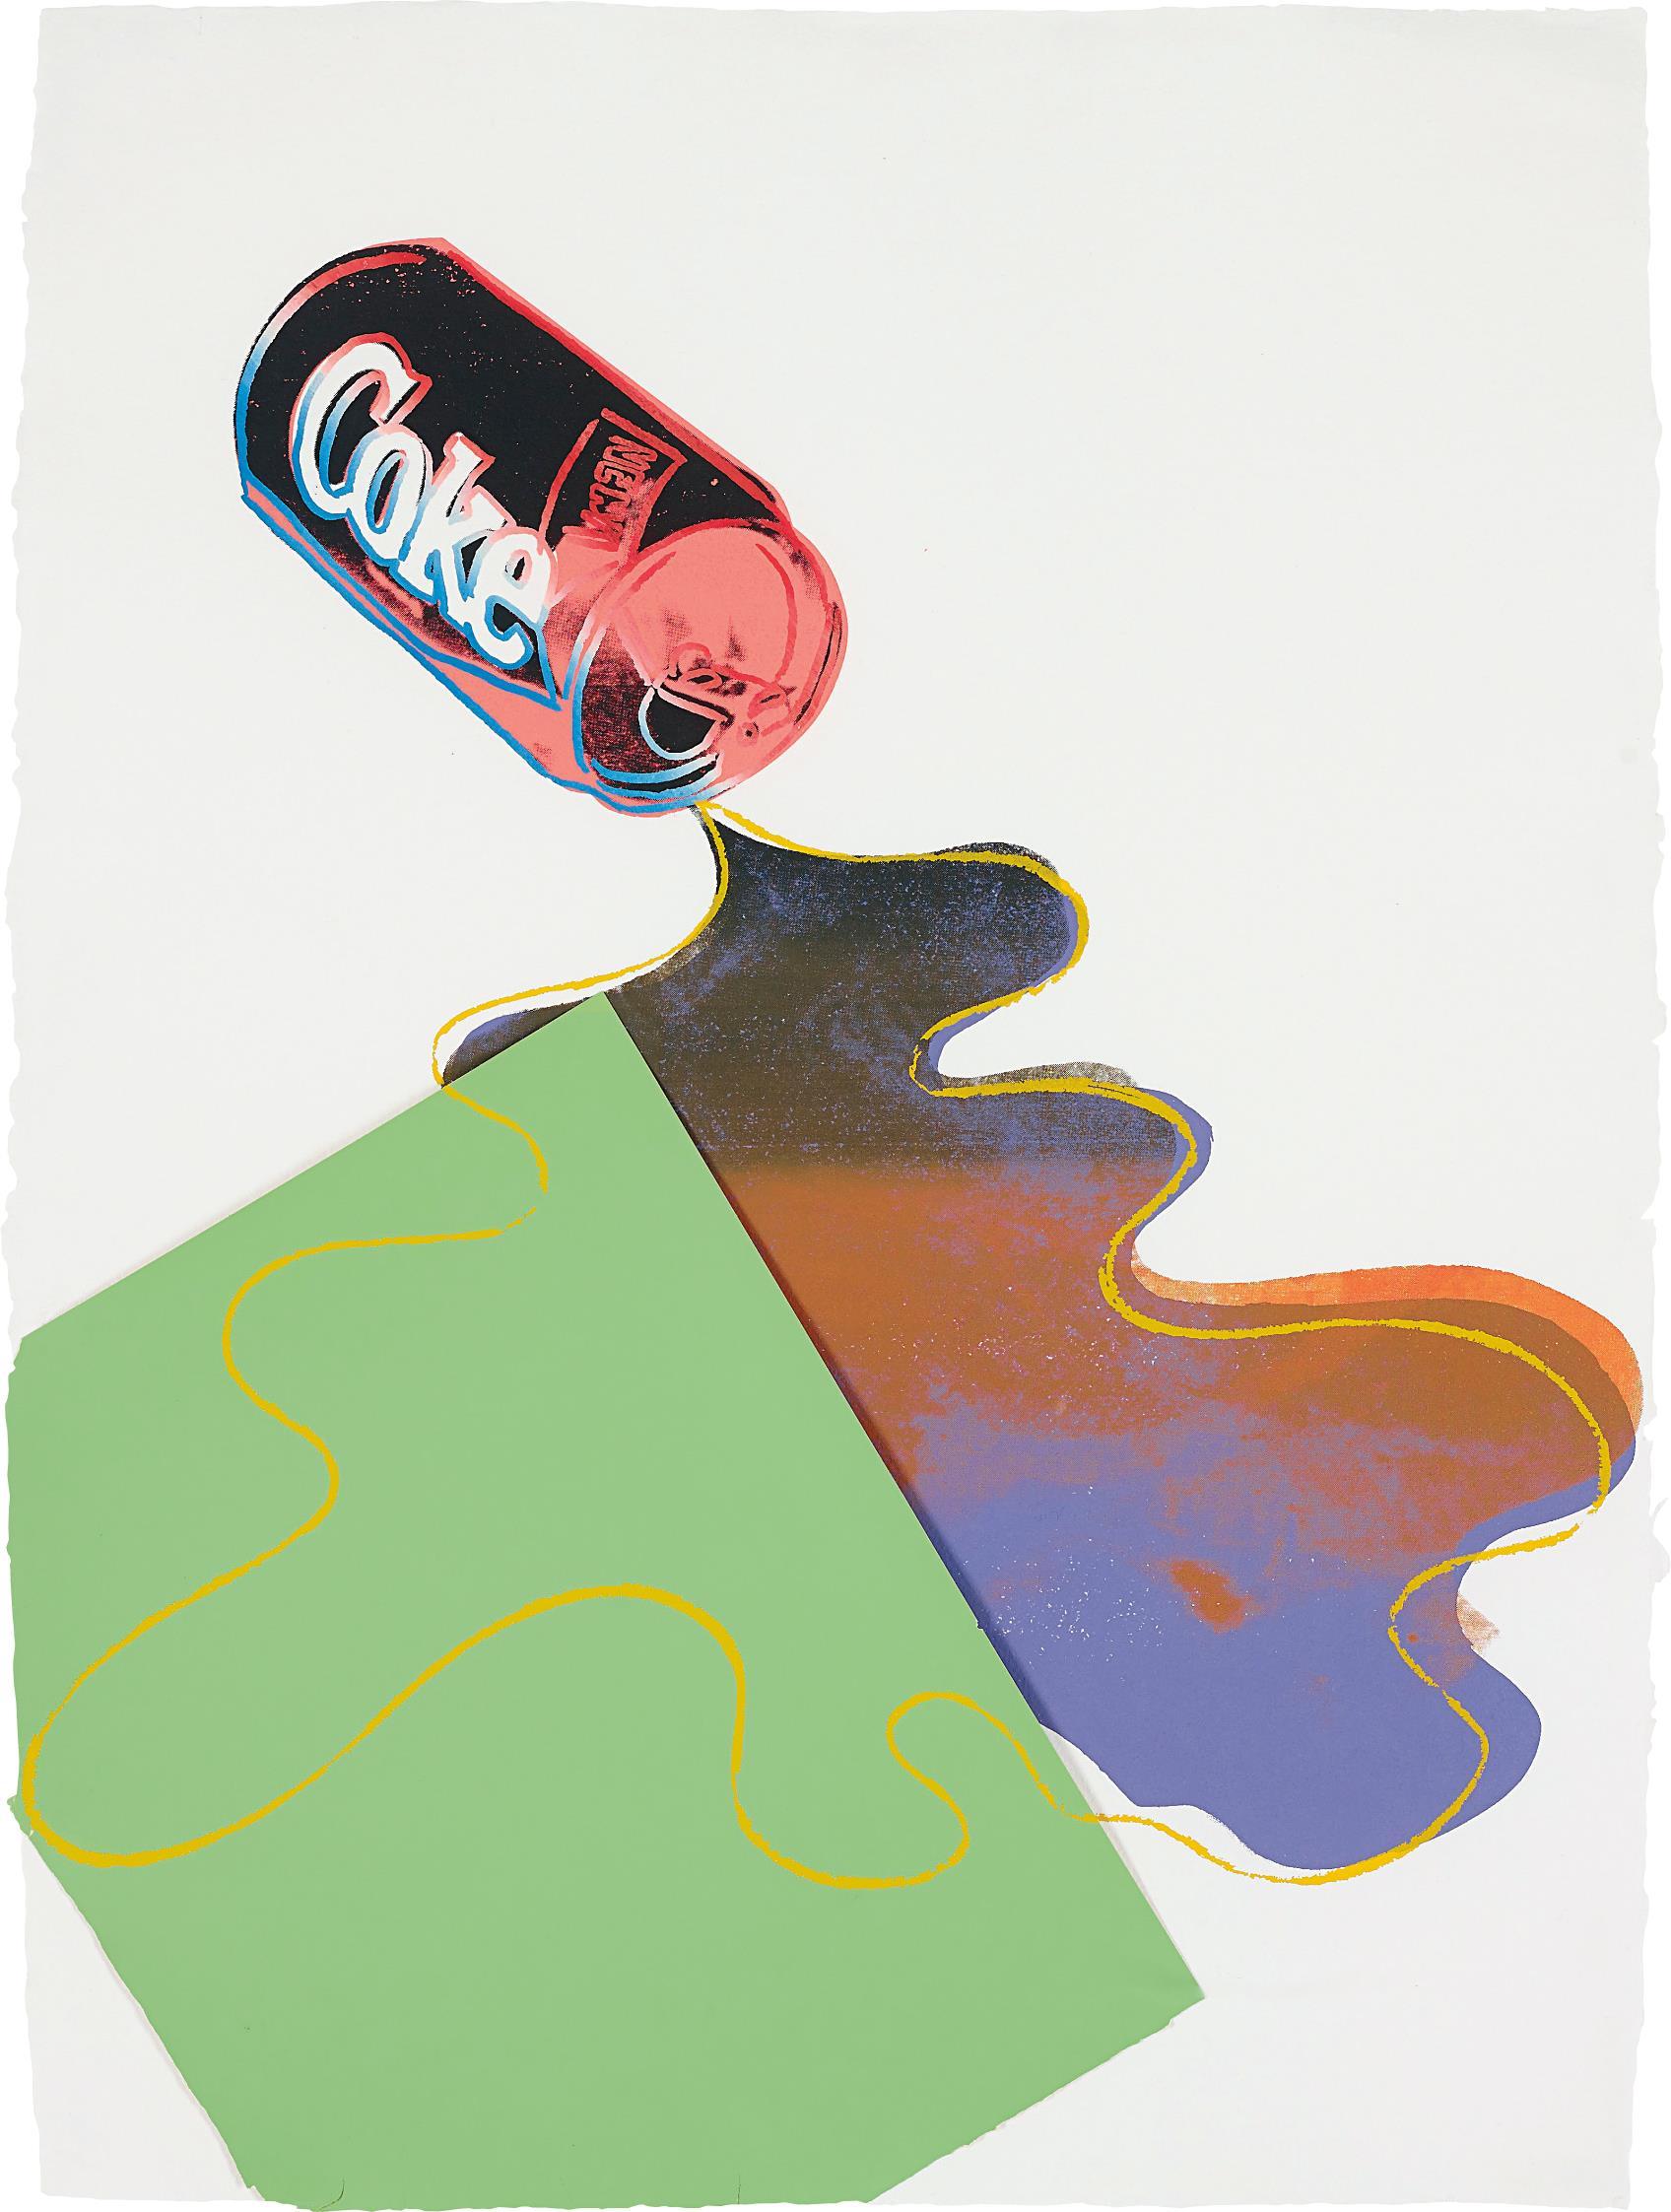 Andy Warhol-New Coke-1985